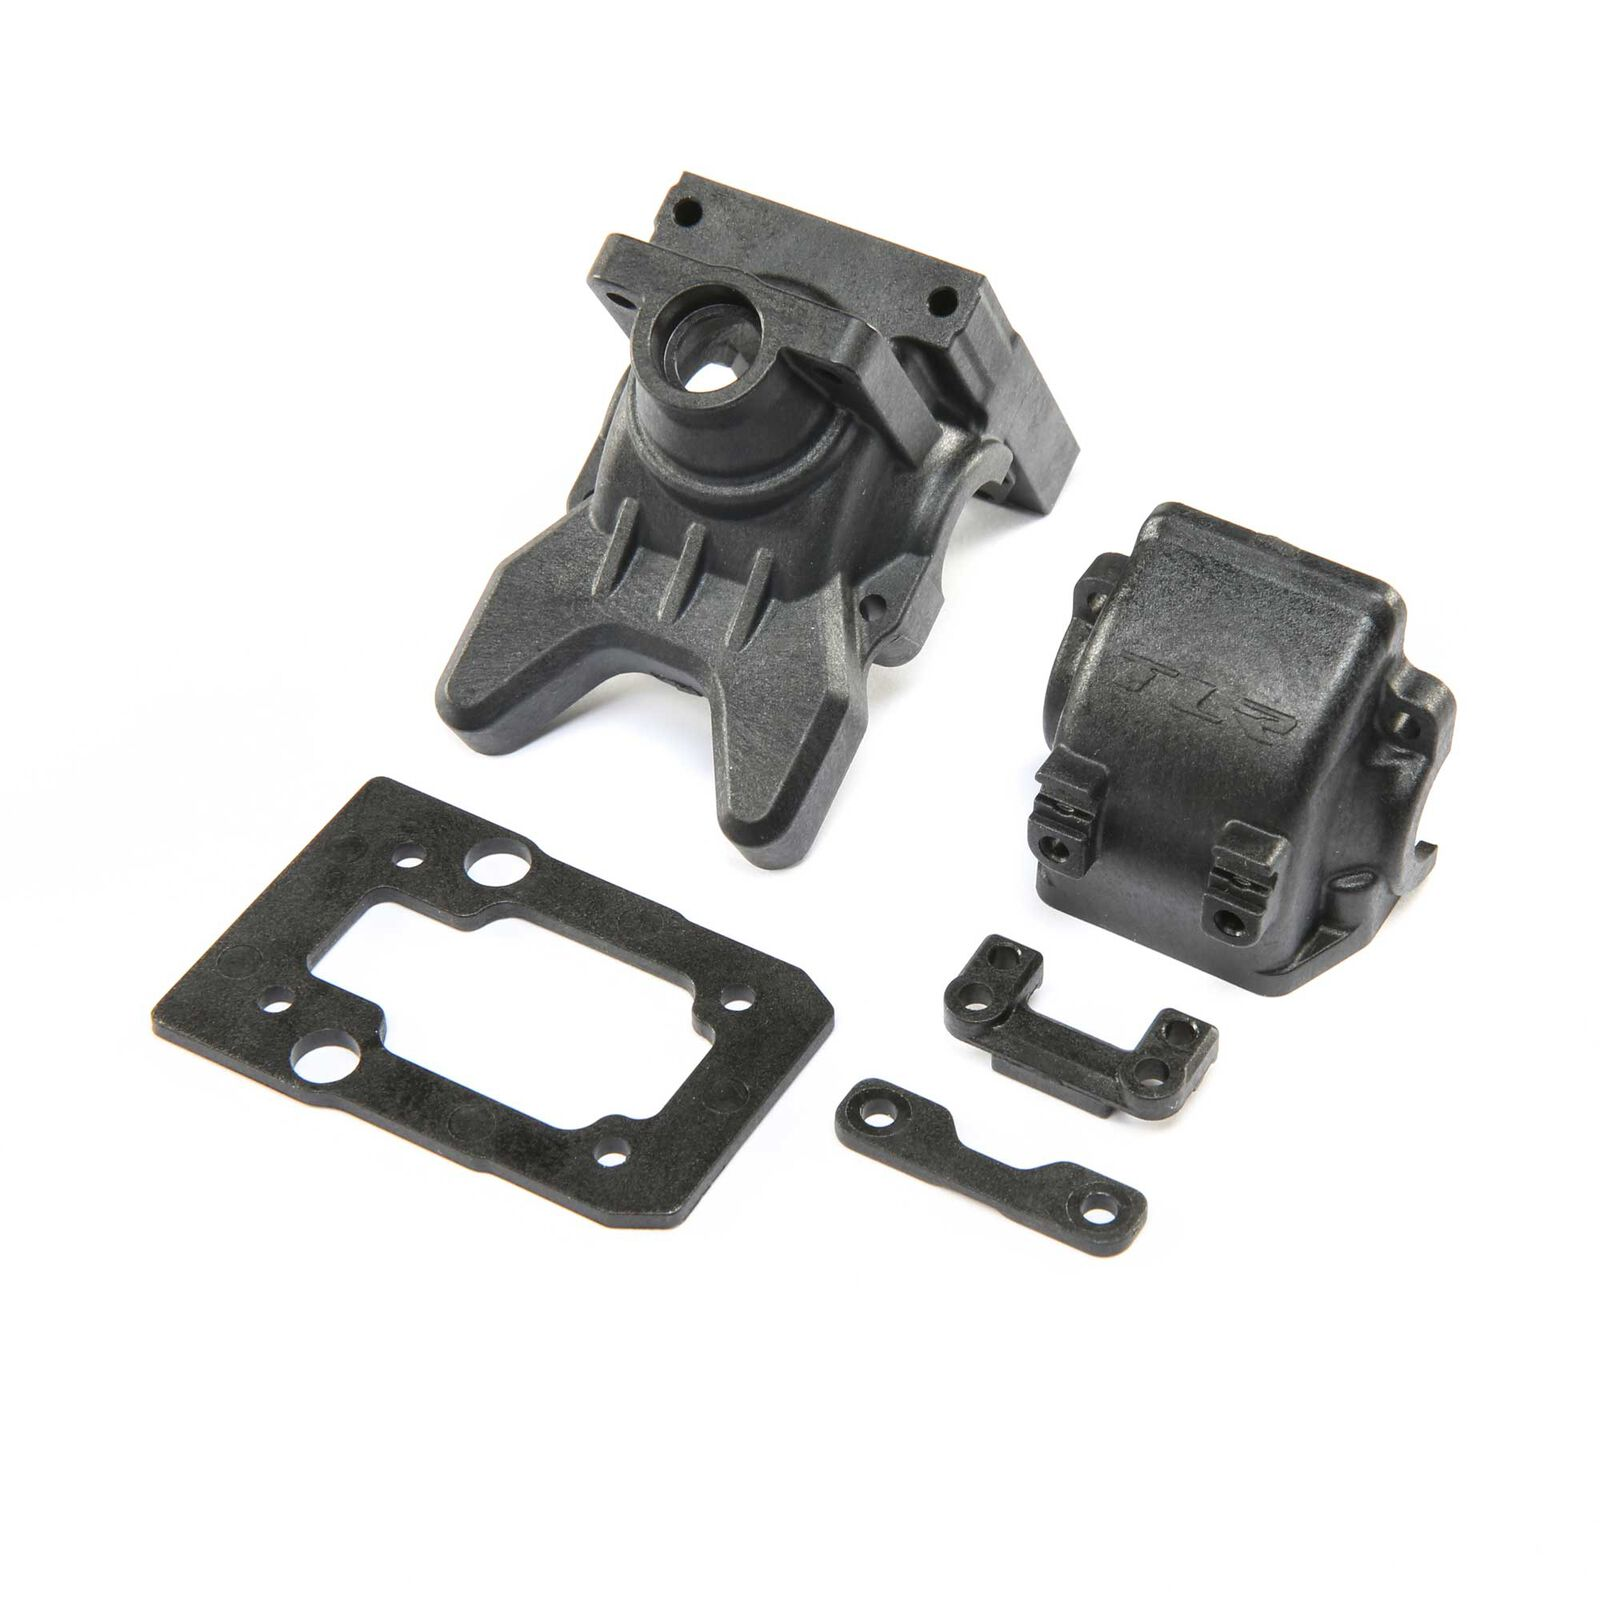 Rear Gear Box Set: 22X-4